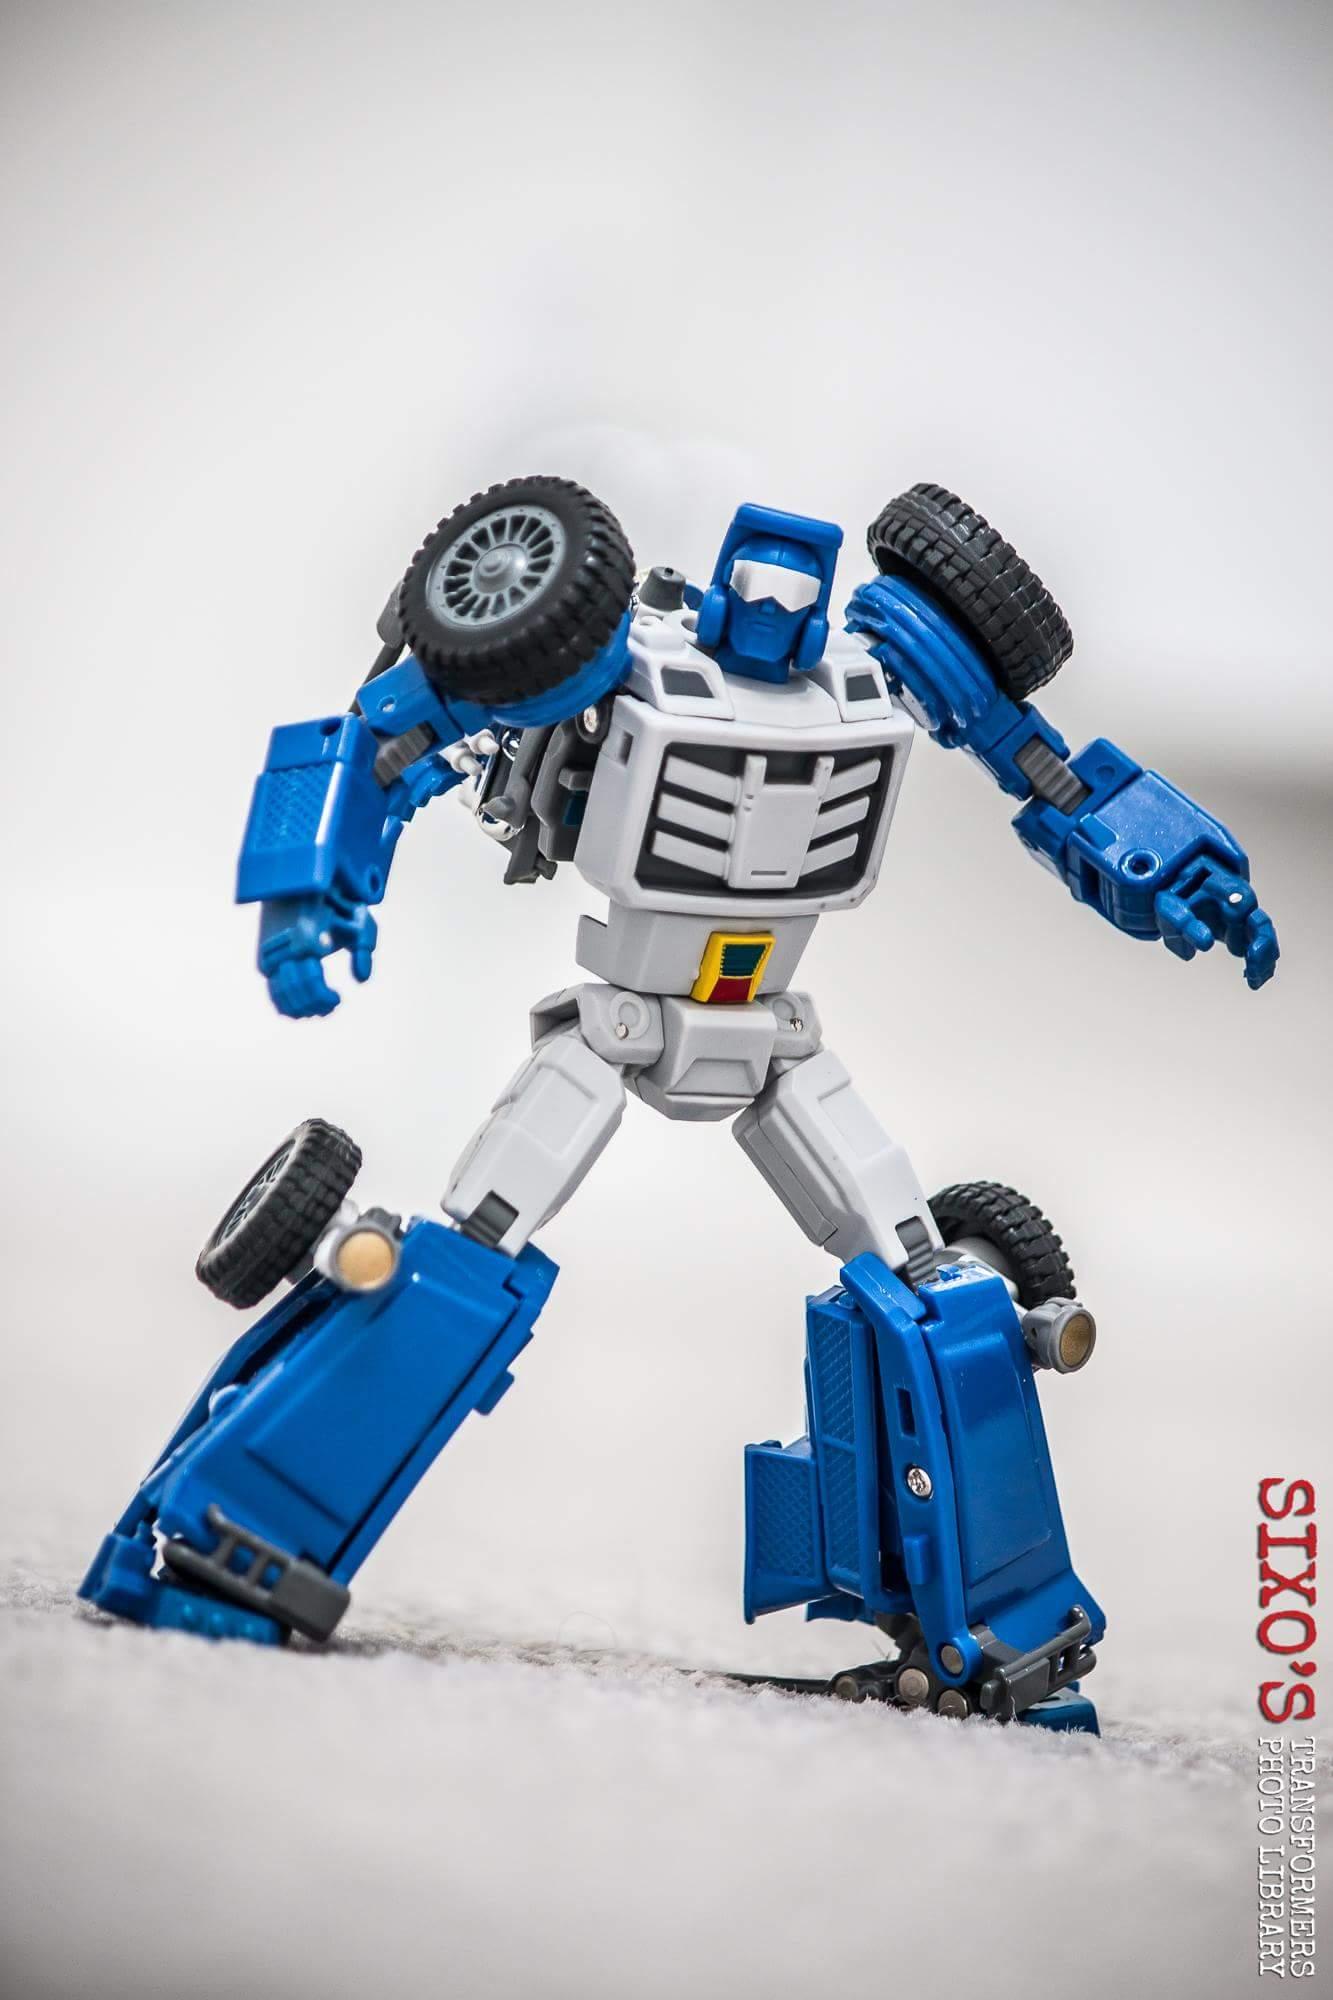 [X-Transbots] Produit Tiers - Minibots MP - Gamme MM - Page 6 ImqJD80p